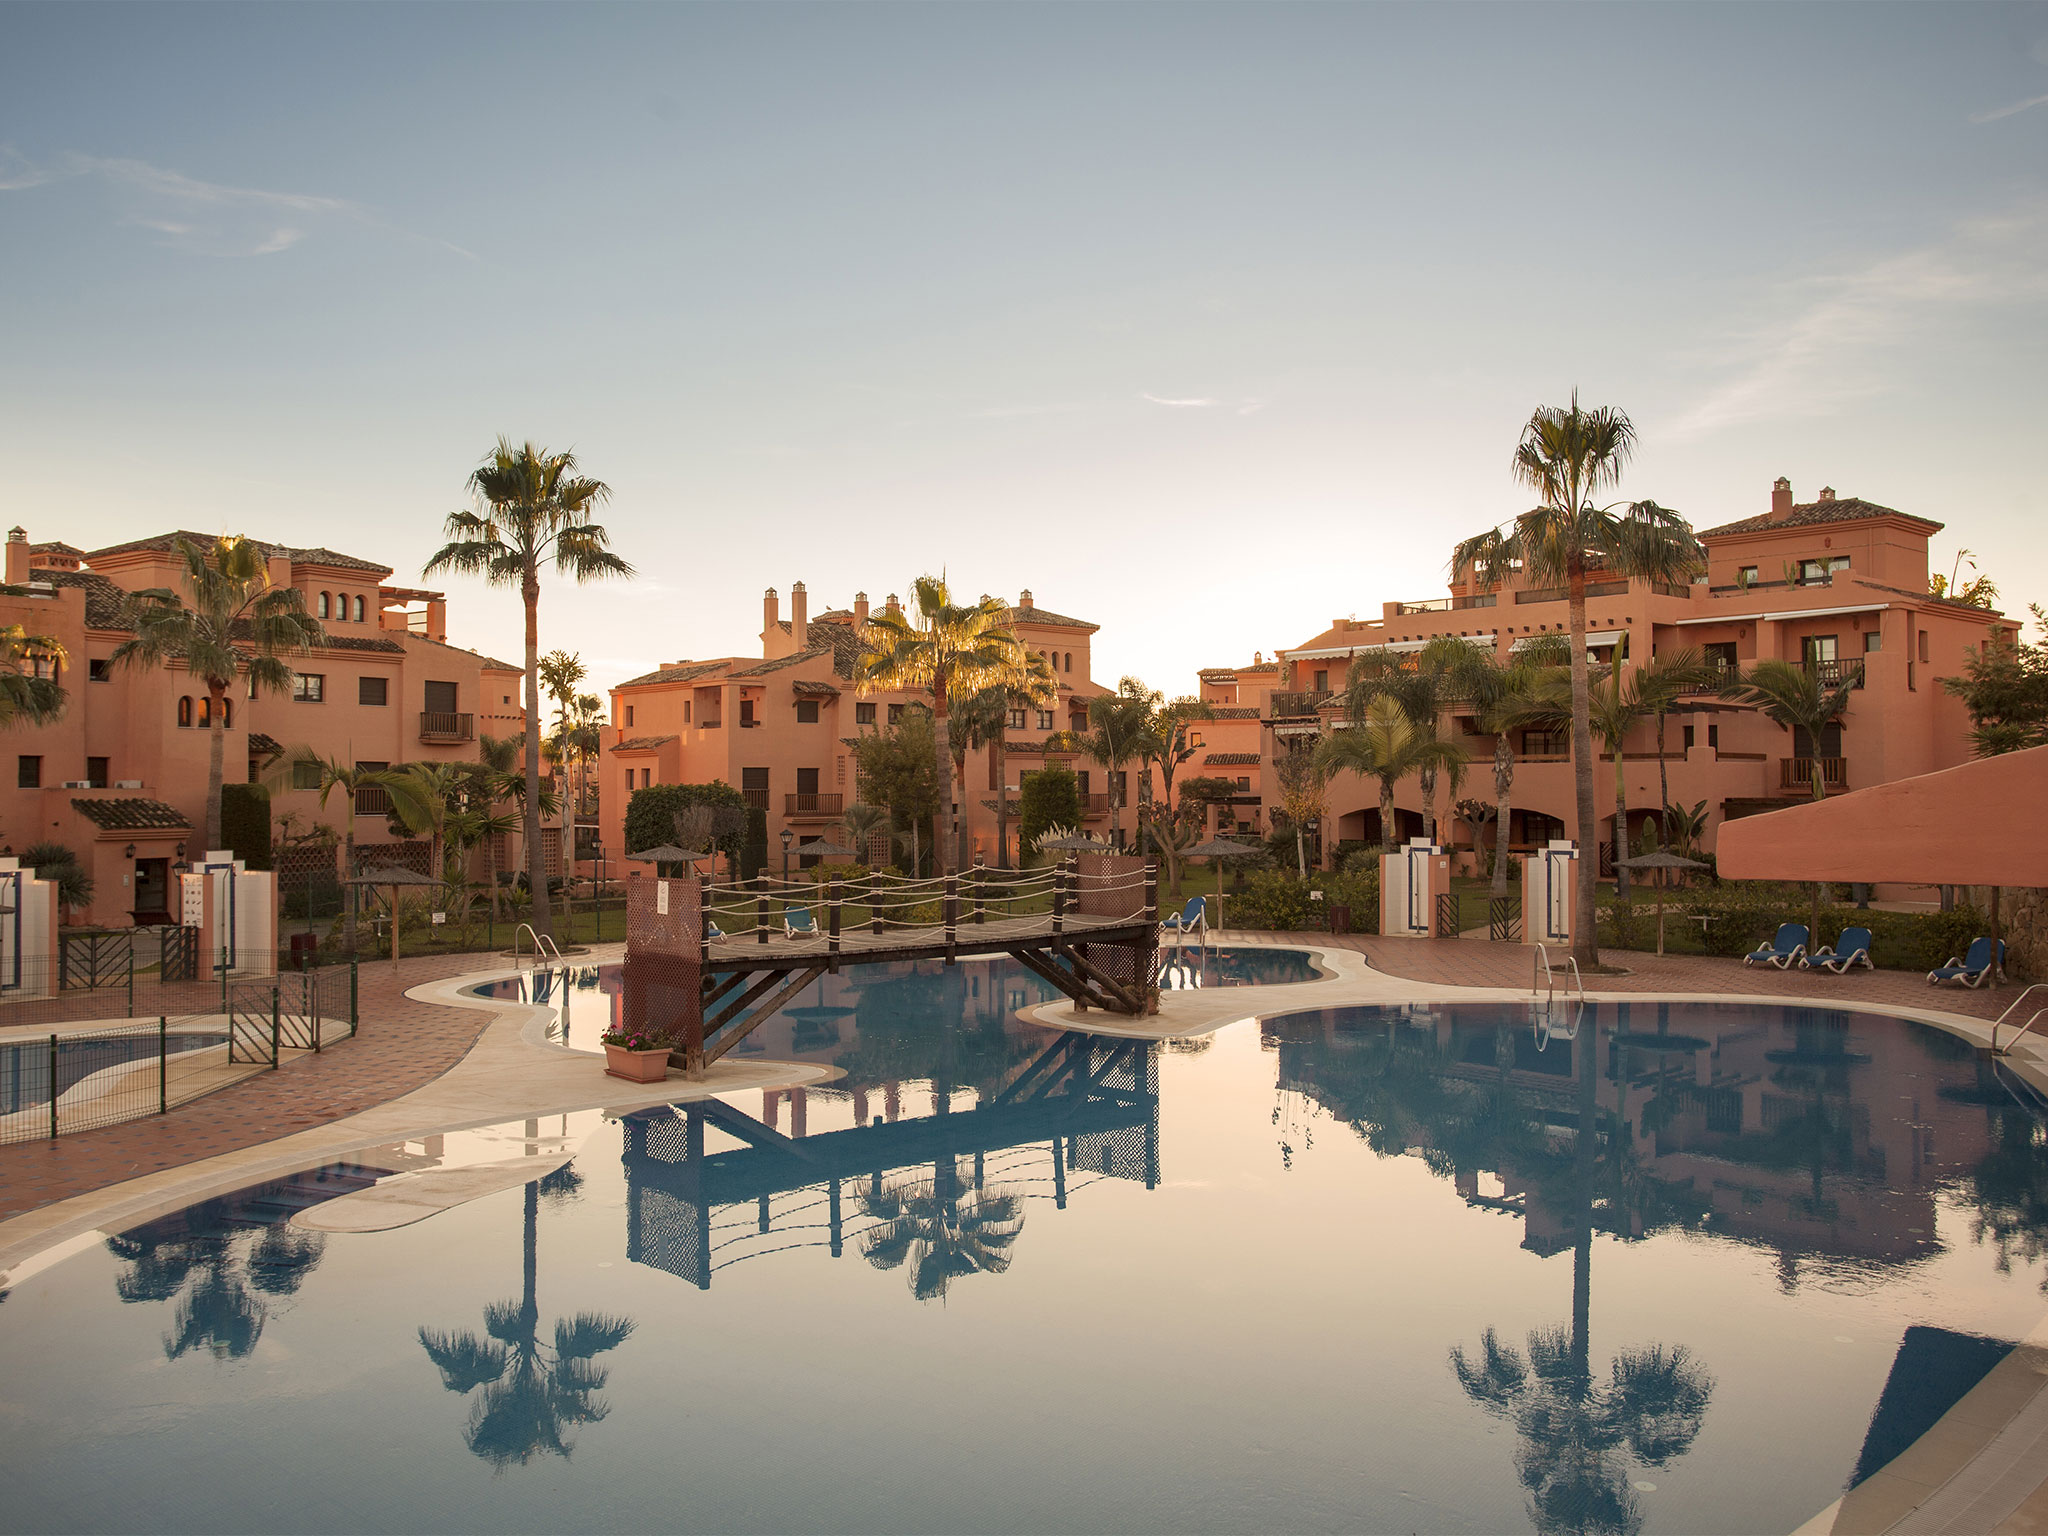 Hacienda del Sol - LiveScape Apartments & Villas